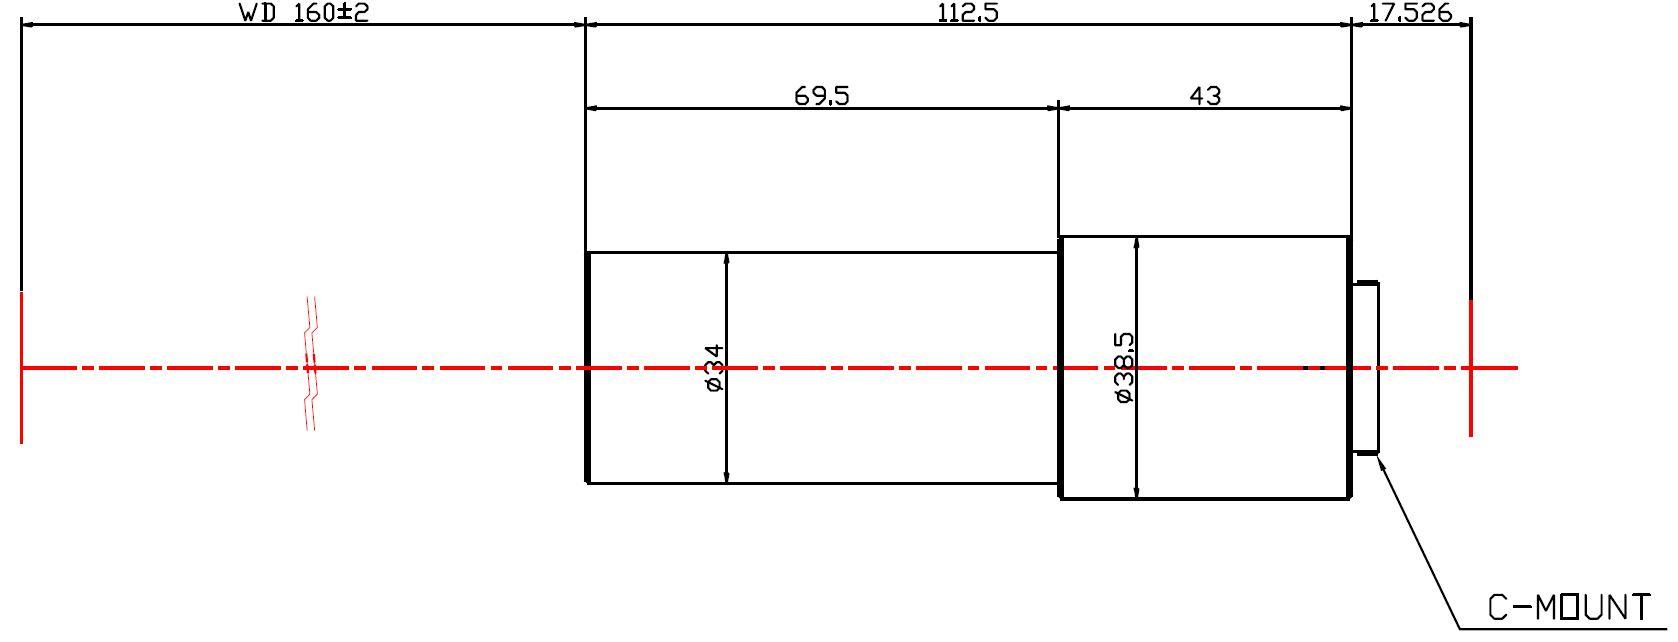 Lensagon MC4M-075-160